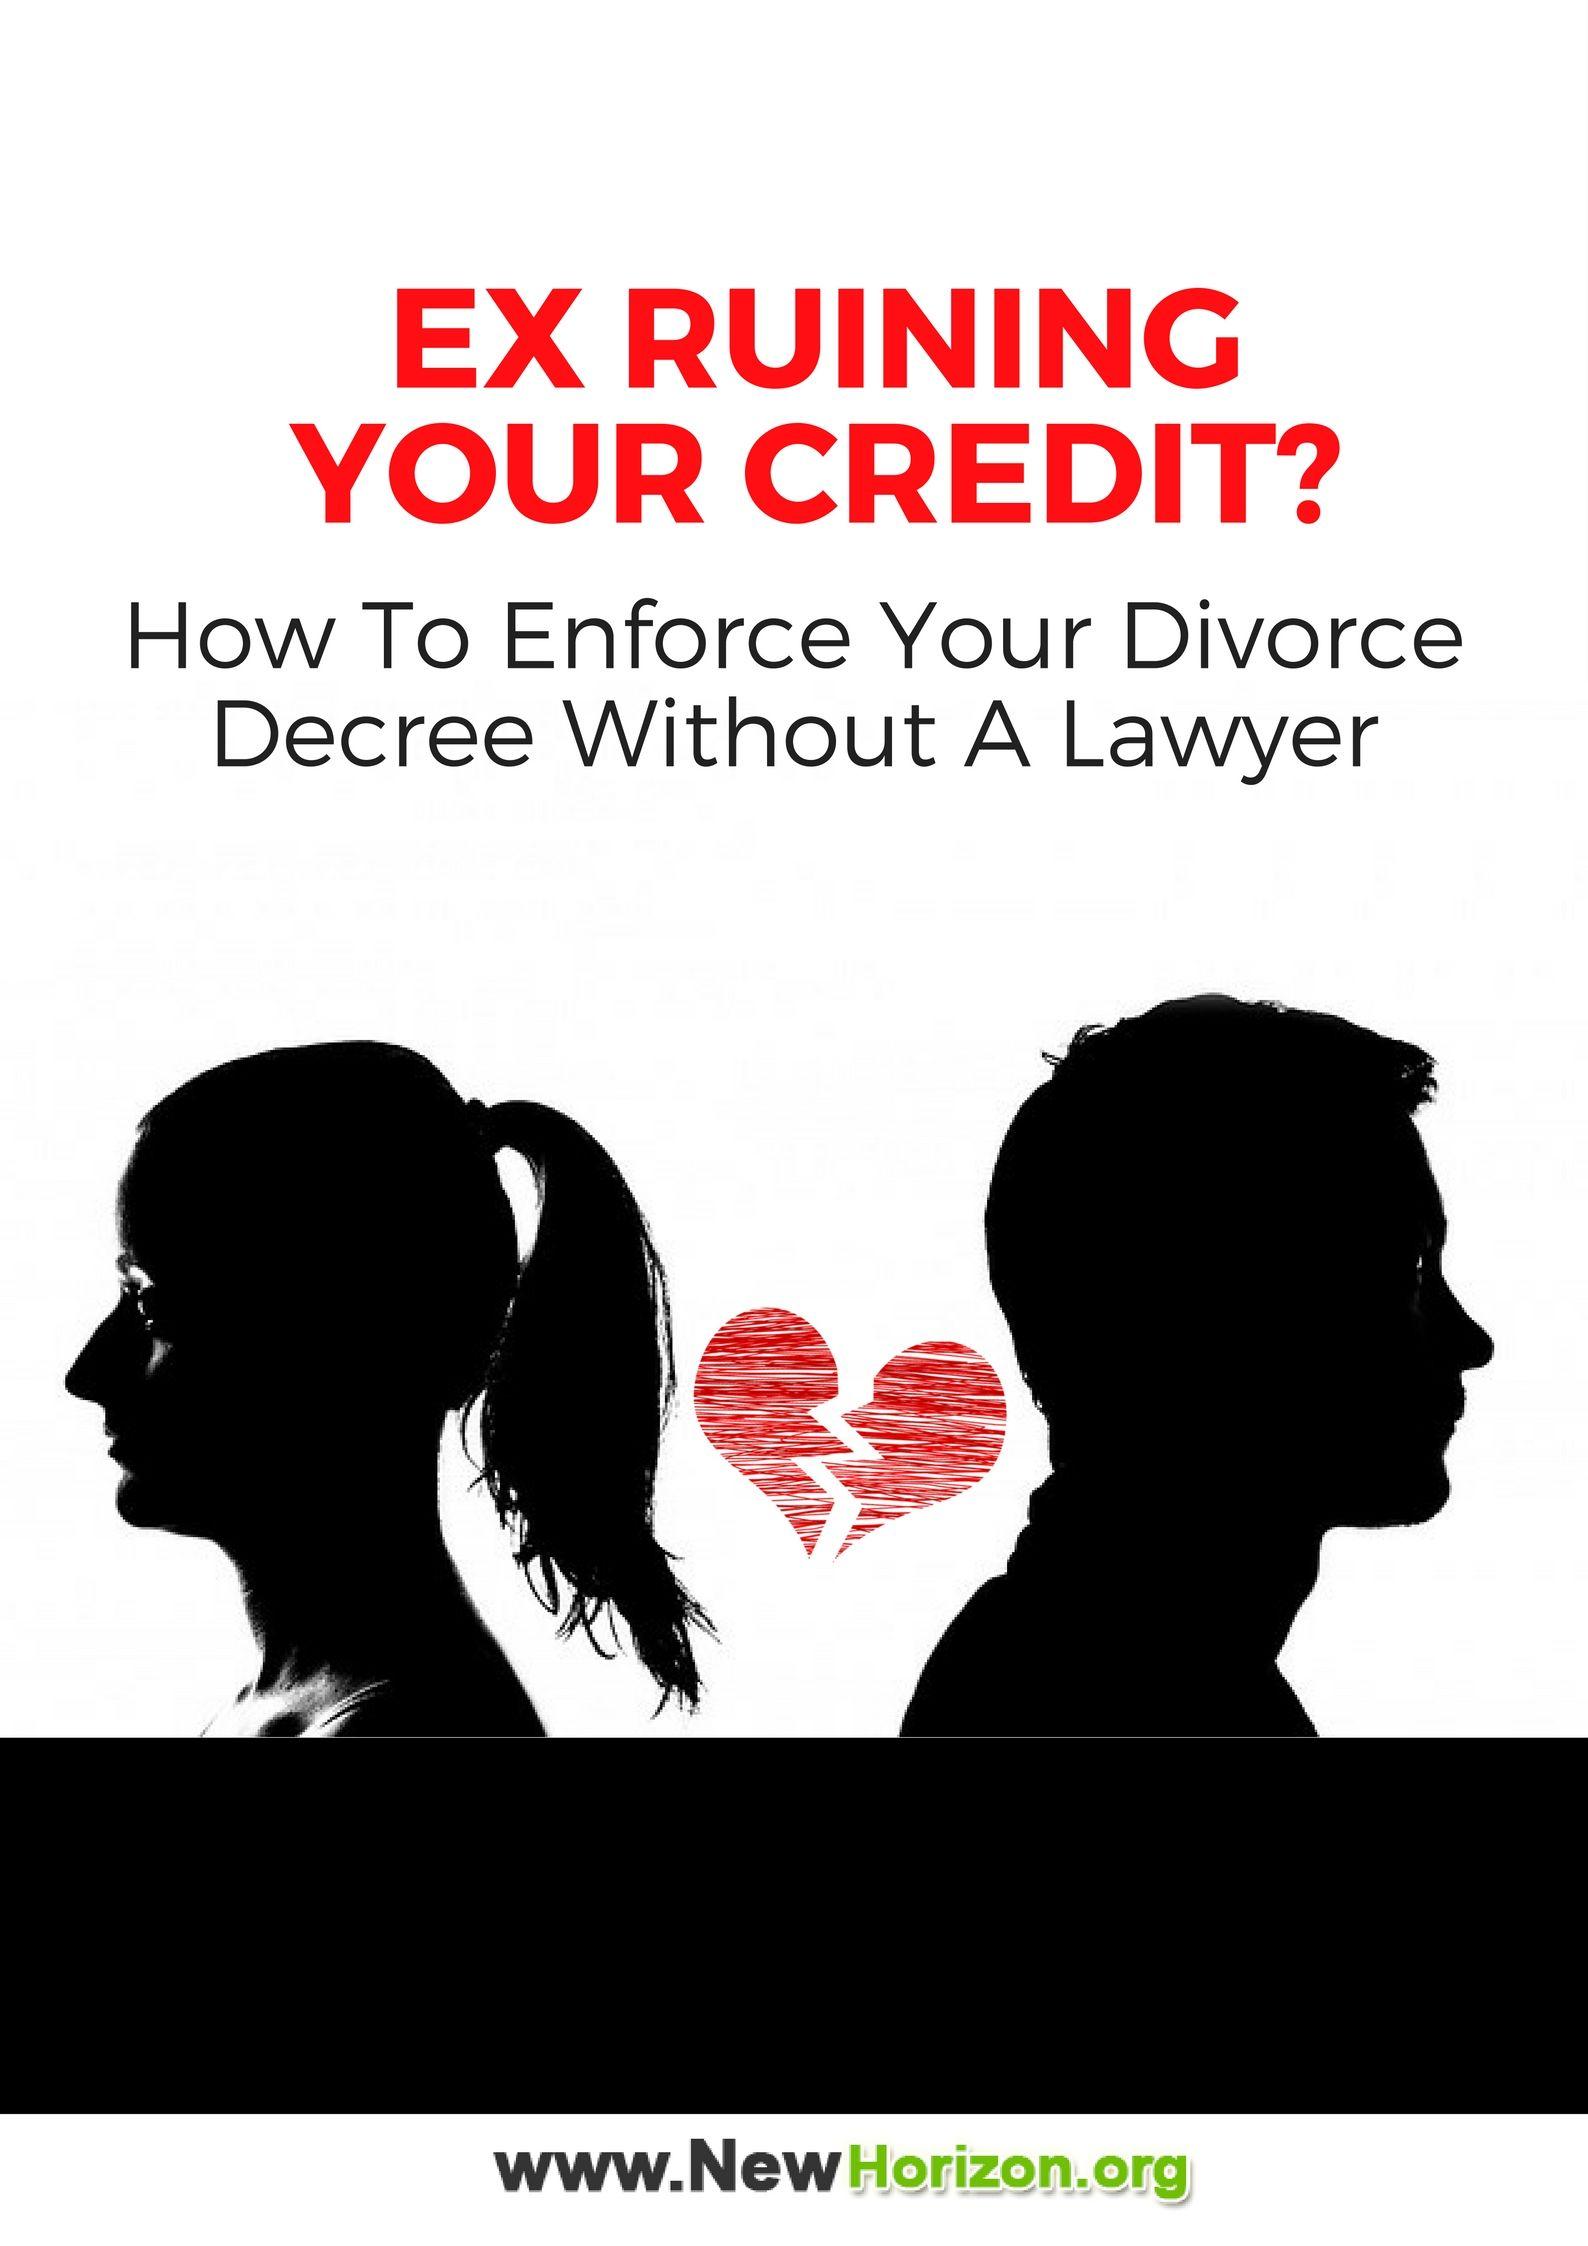 How to Enforce a Divorce Decree recommend